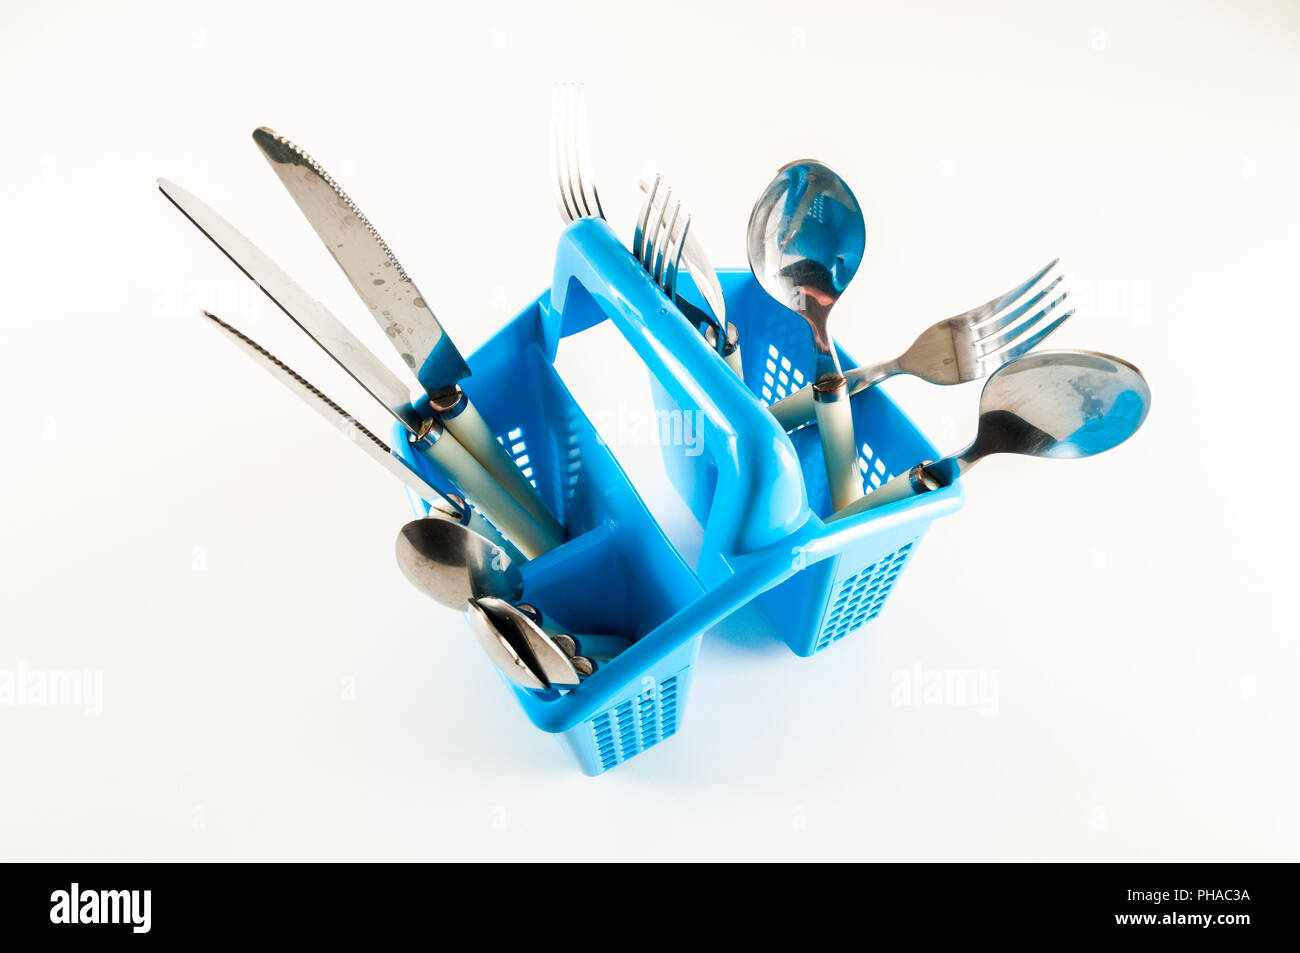 Plastic kitchen utensils - Stock Image